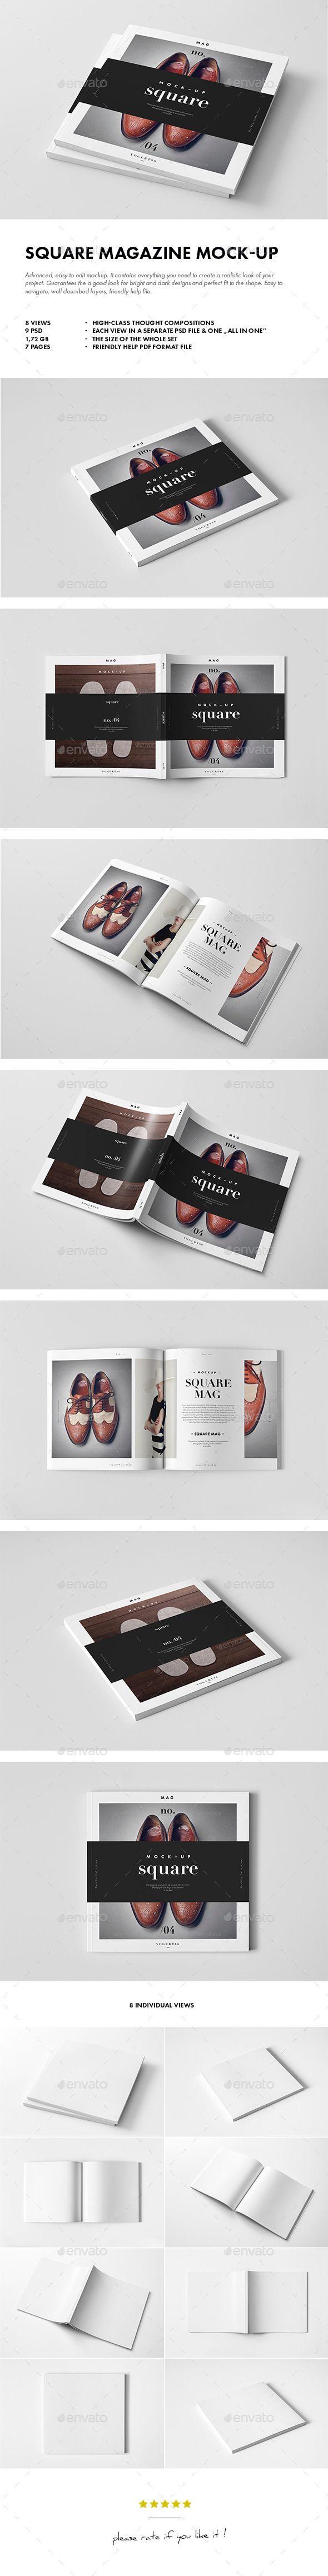 Square Magazine Mock-up   Buy and Download: http://graphicriver.net/item/square-magazine-mockup/9877732?ref=ksioks